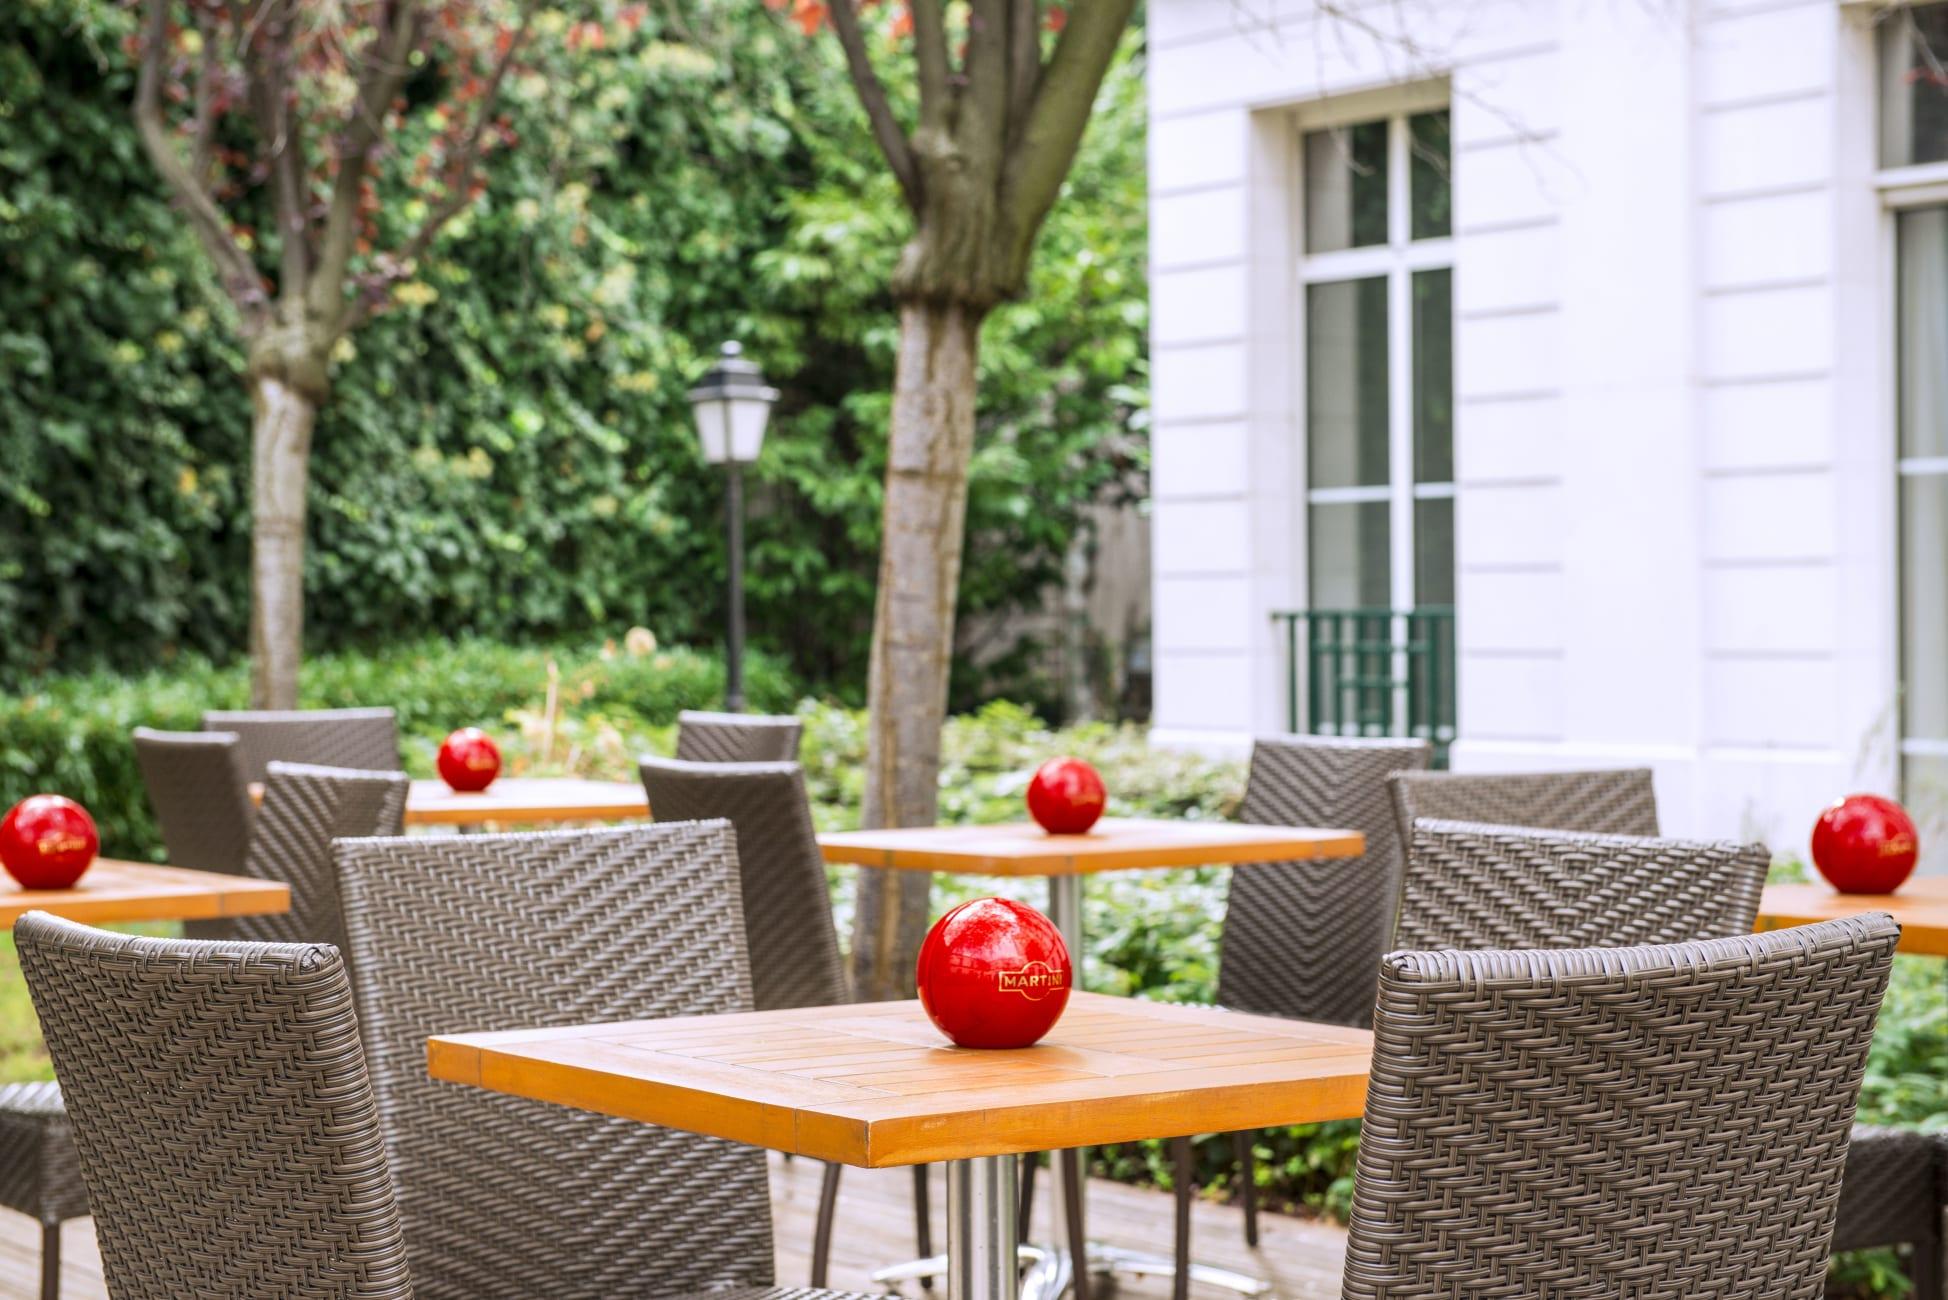 Otel Hotel Vacances Bleues Villa Modigliani, Paris - Trivago ... concernant Timhotel Jardin Des Plantes Hotel Paris